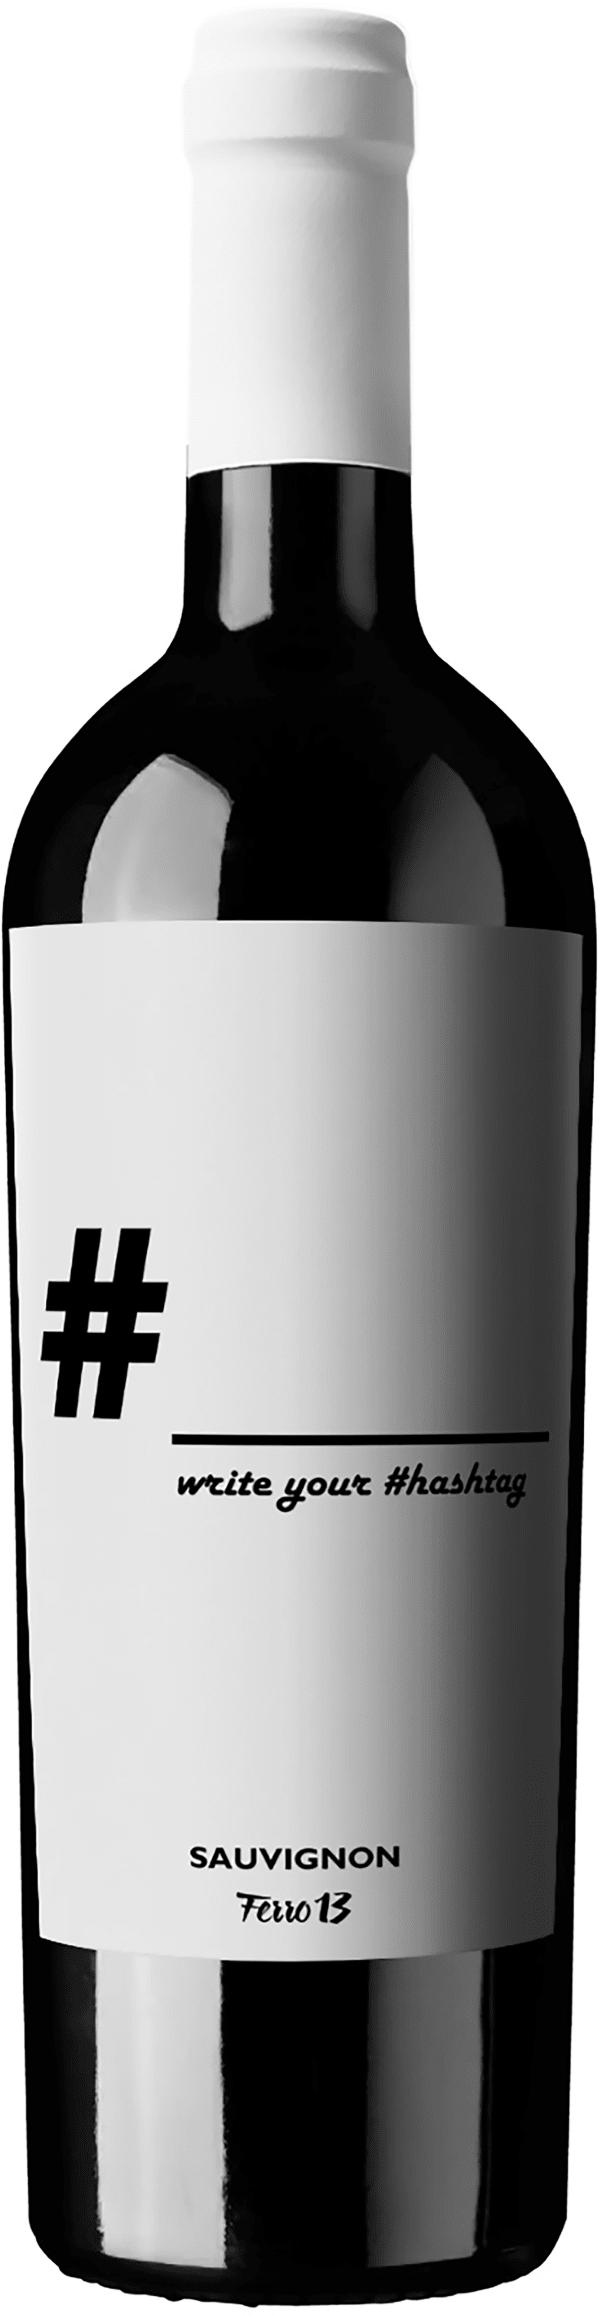 Hashtag Sauvignon 2017